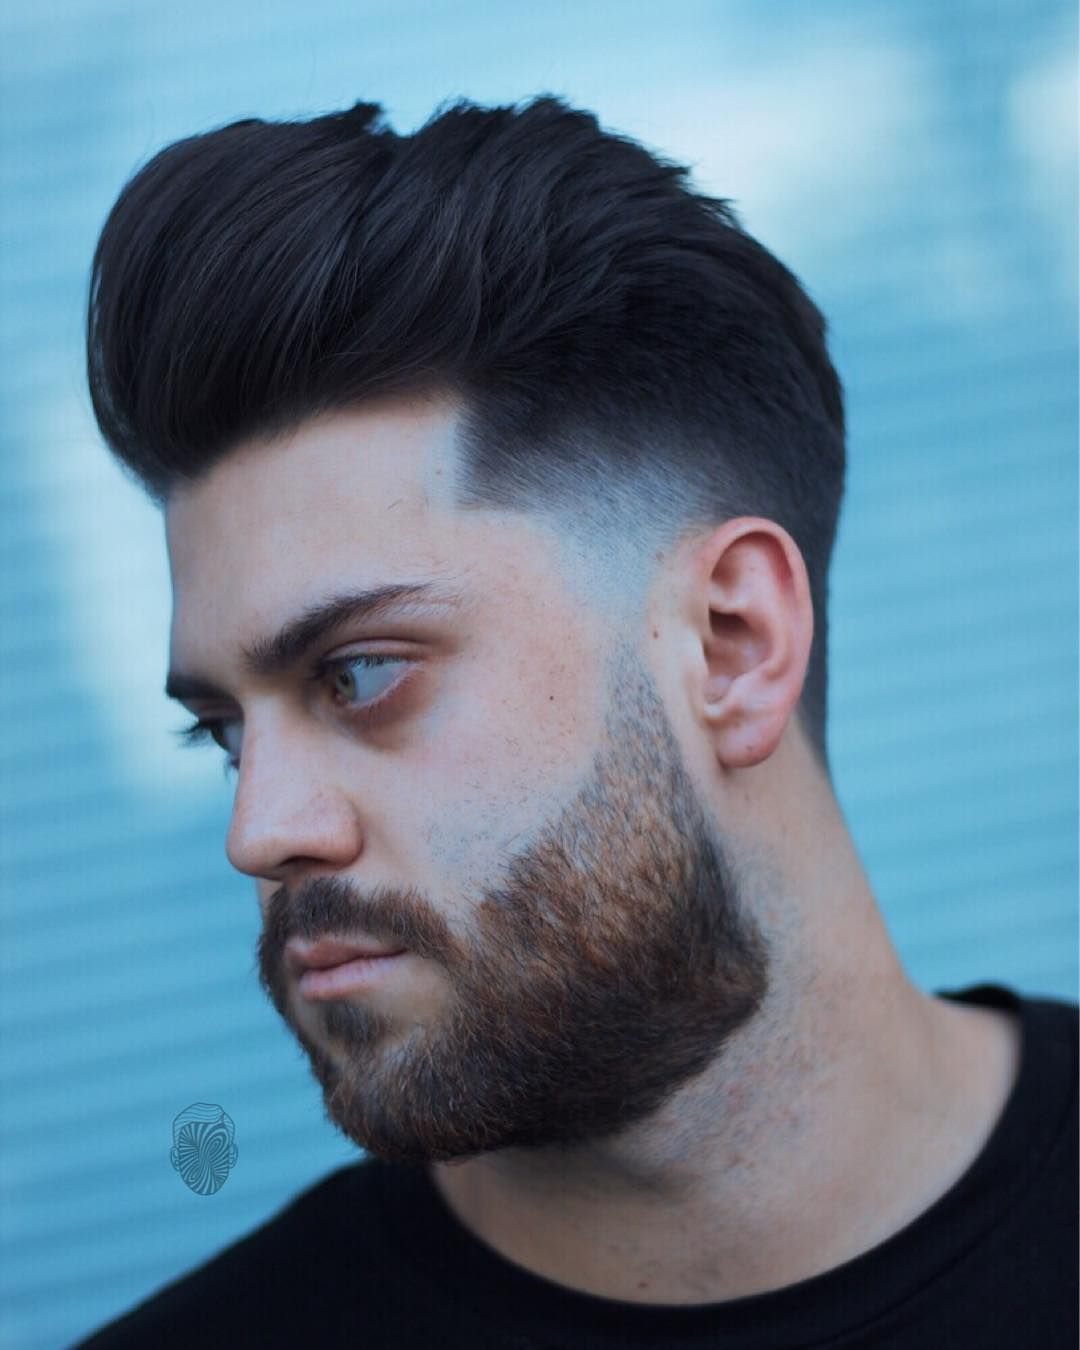 25 Popular The Pompadour Haircut 2018 Men S Hairstyle Swag High Fade Pompadour Pompadour Hairstyle Pompadour Haircut